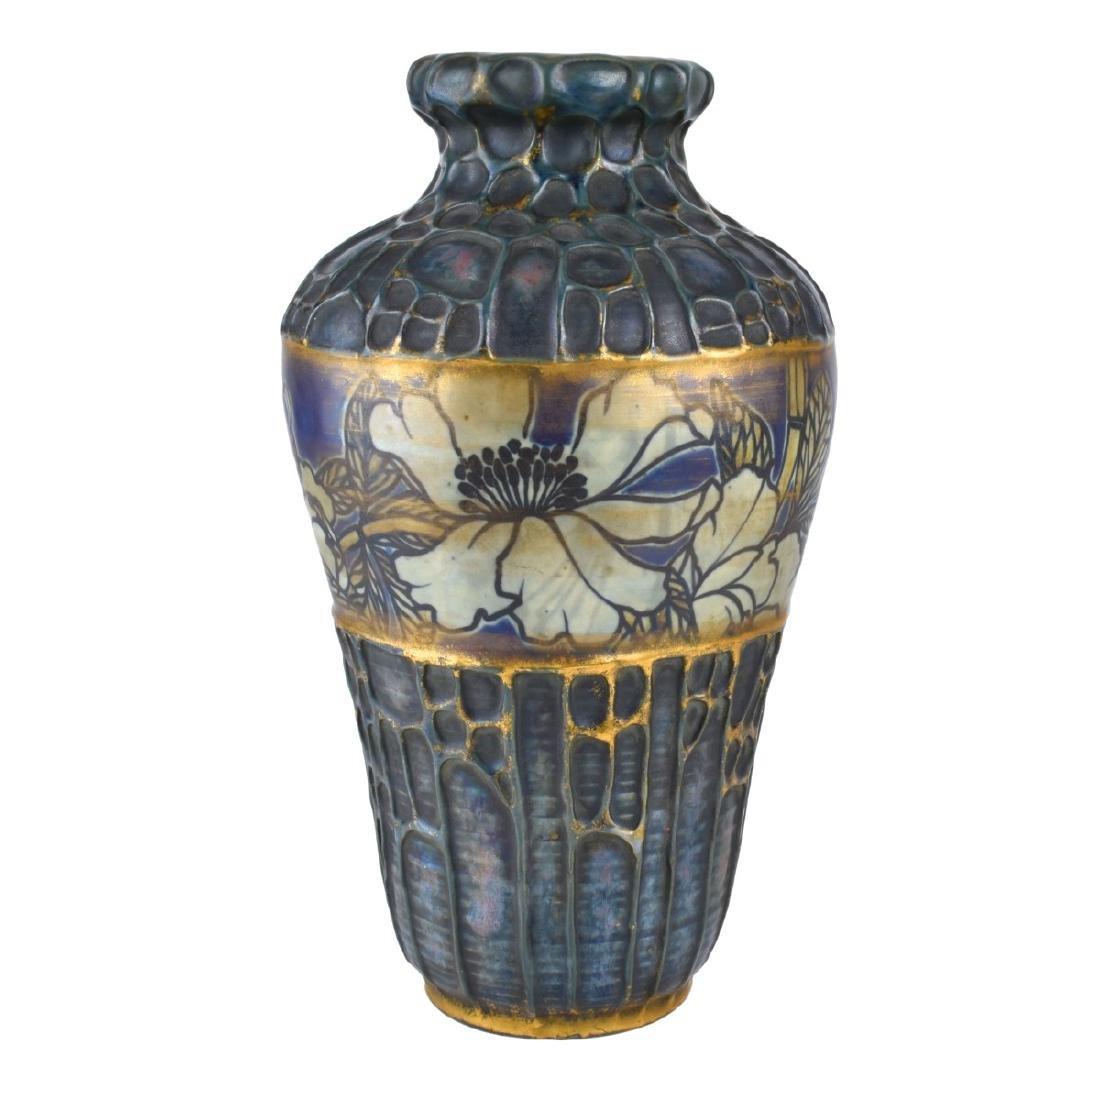 Amphora Honeycomb and Poppy Vase